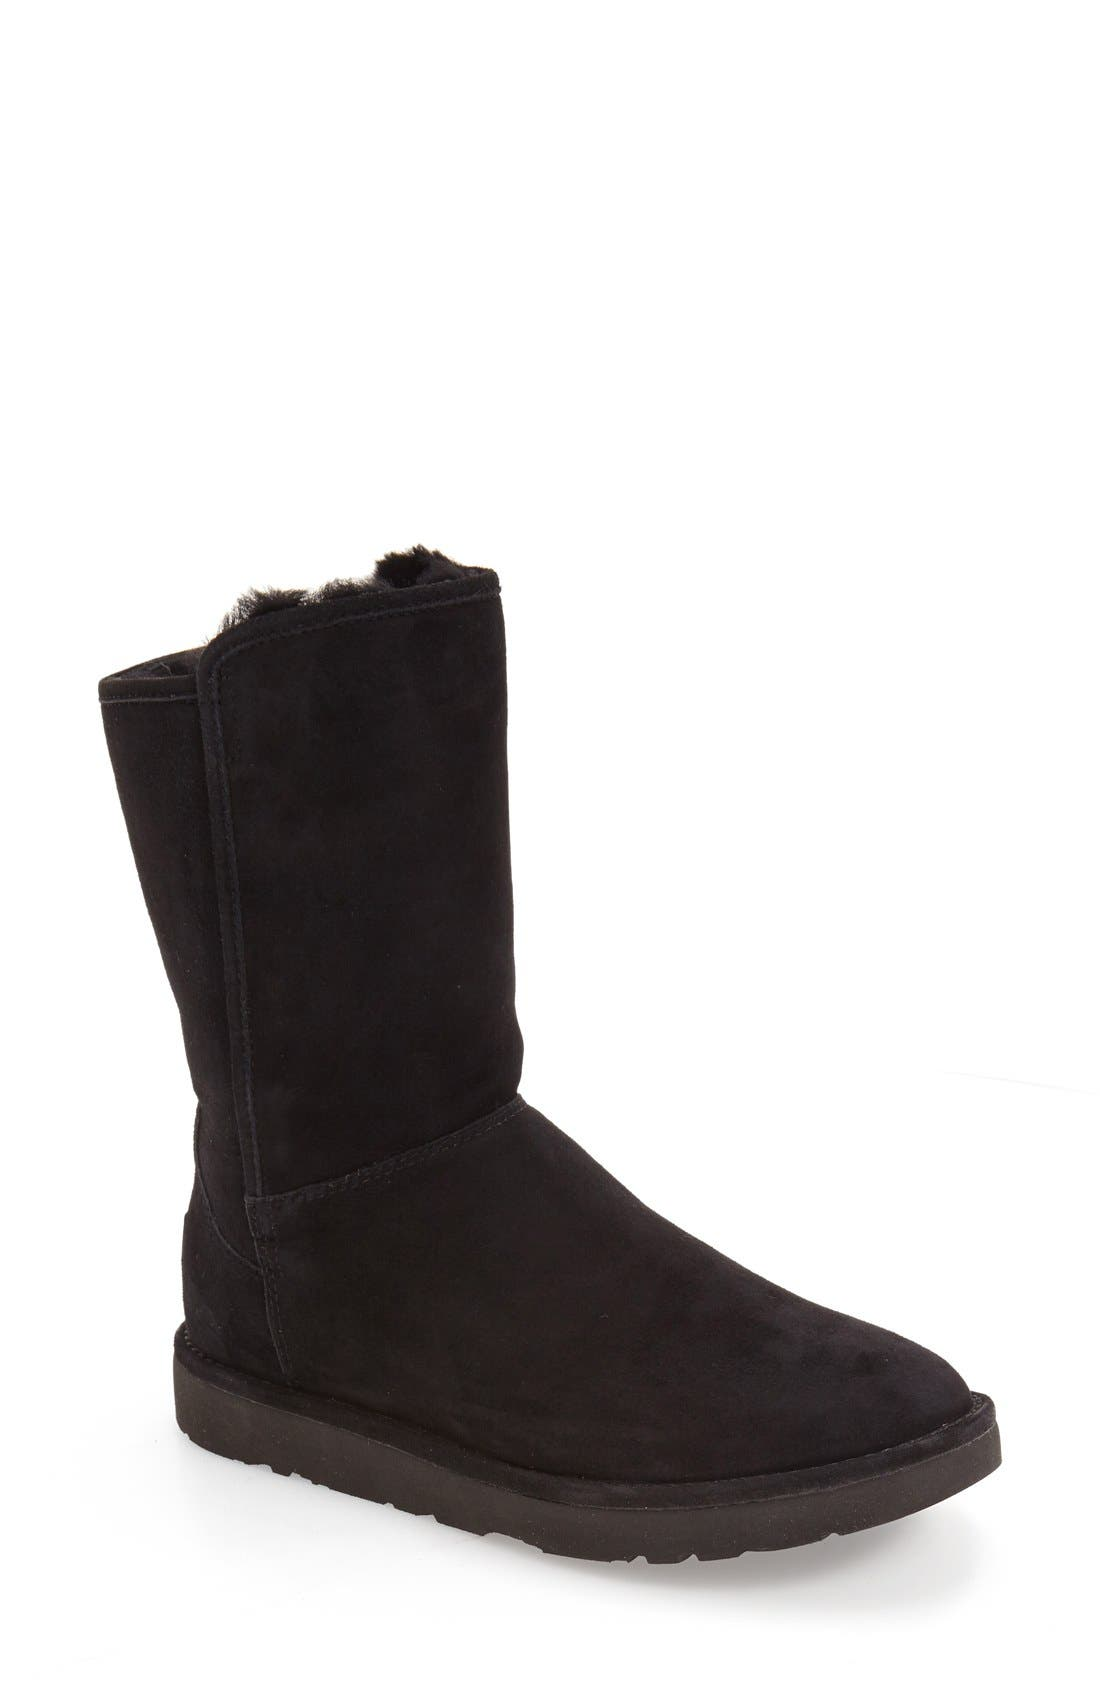 Ugg Abree Ii Short Boot, Black